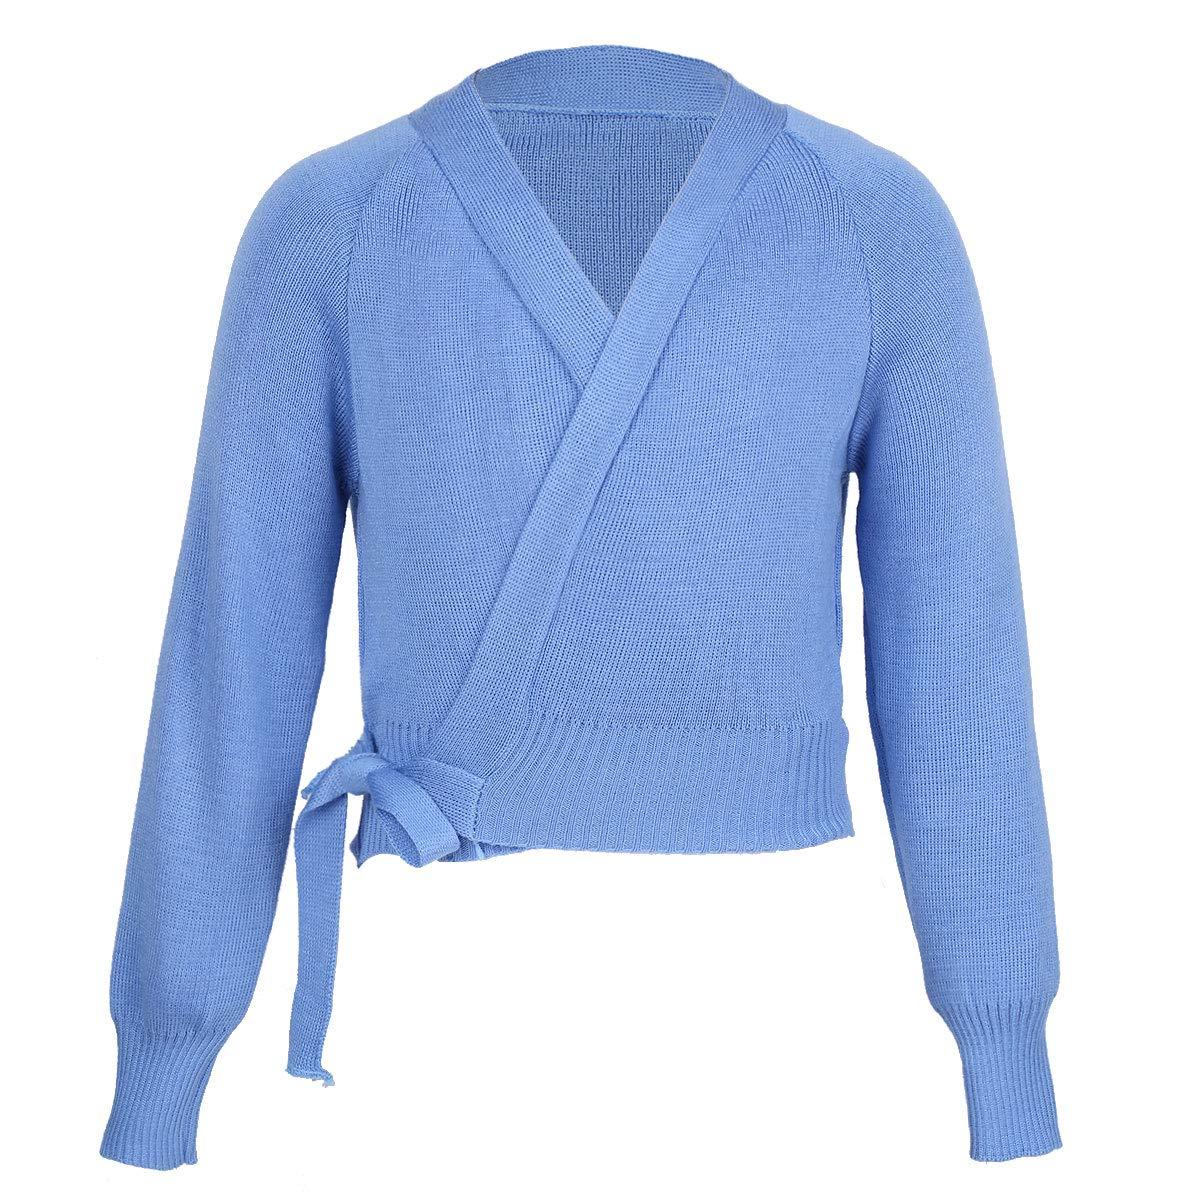 MSemis Kids Girls Cotton Long Sleeve Knit Cardigan Sweaters Ballet Dance Front Knot Wrap Tops Coat Shrug